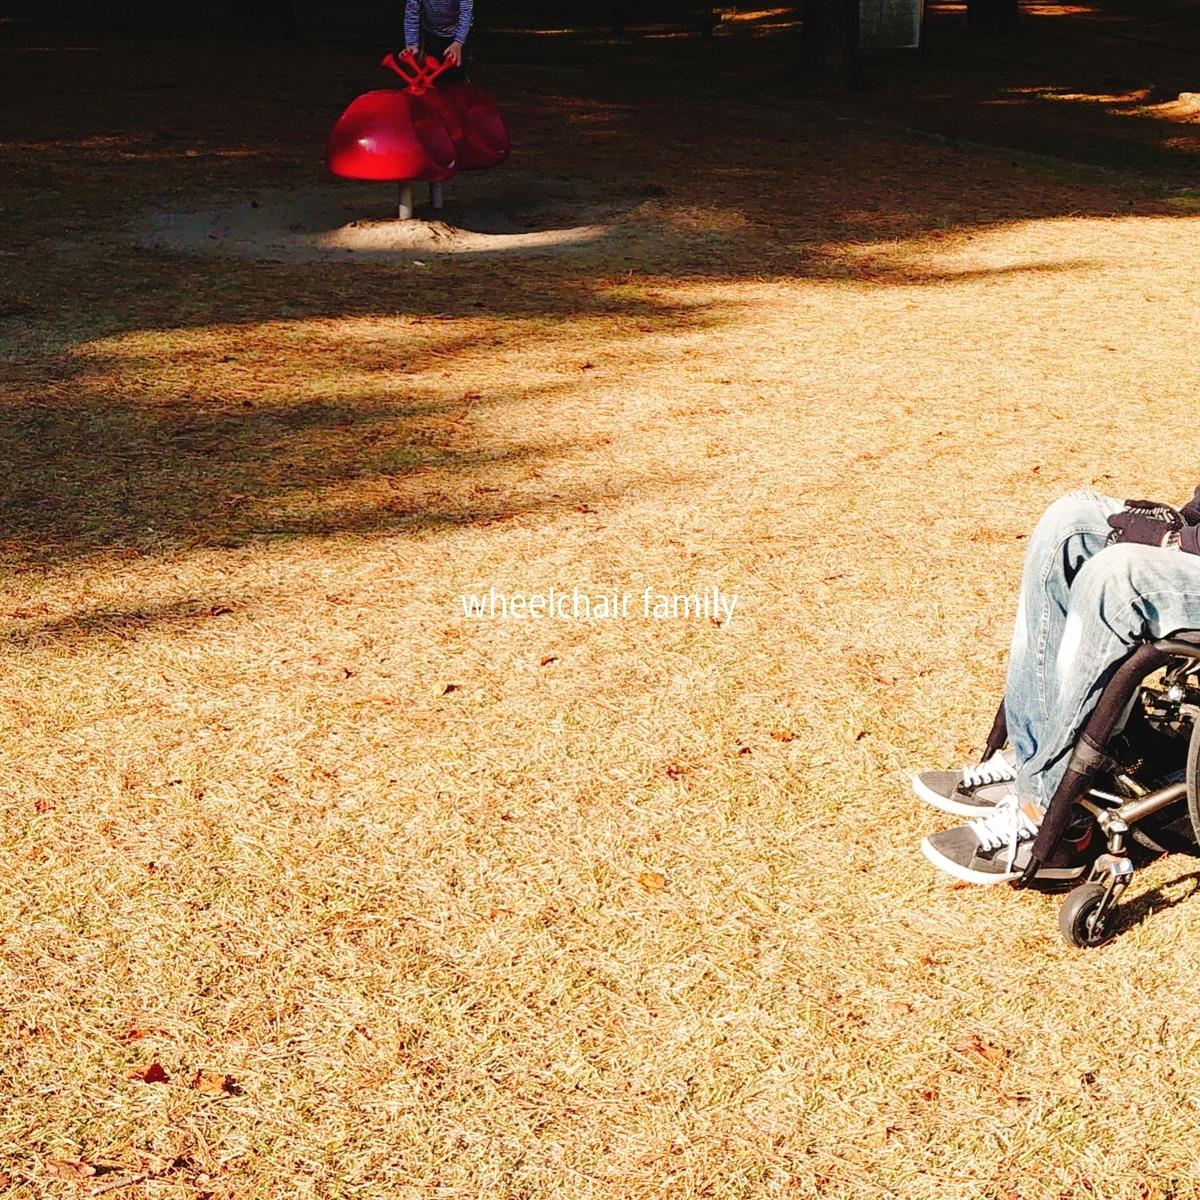 f:id:WheelchairFamily:20201116211331j:plain